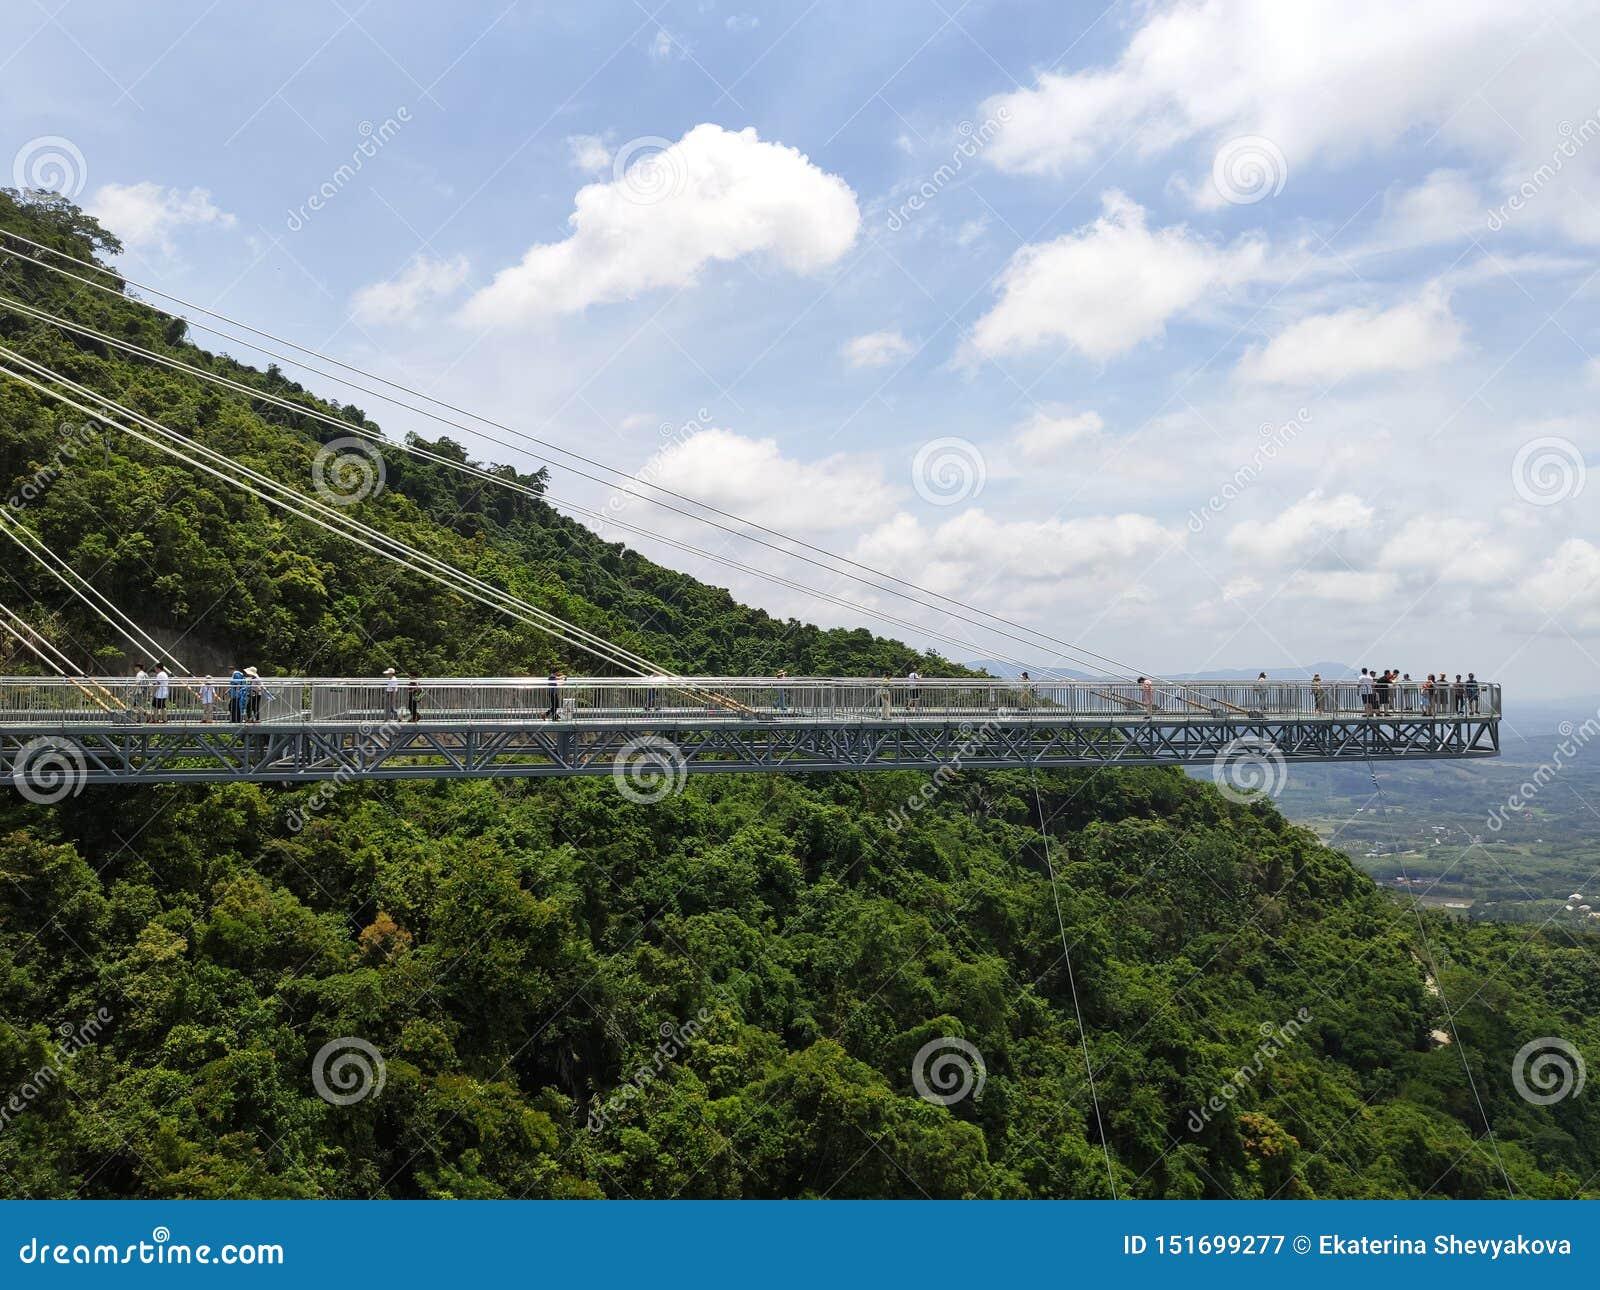 The Glass Bridge In The Yanoda Stock Image - Image of cliff